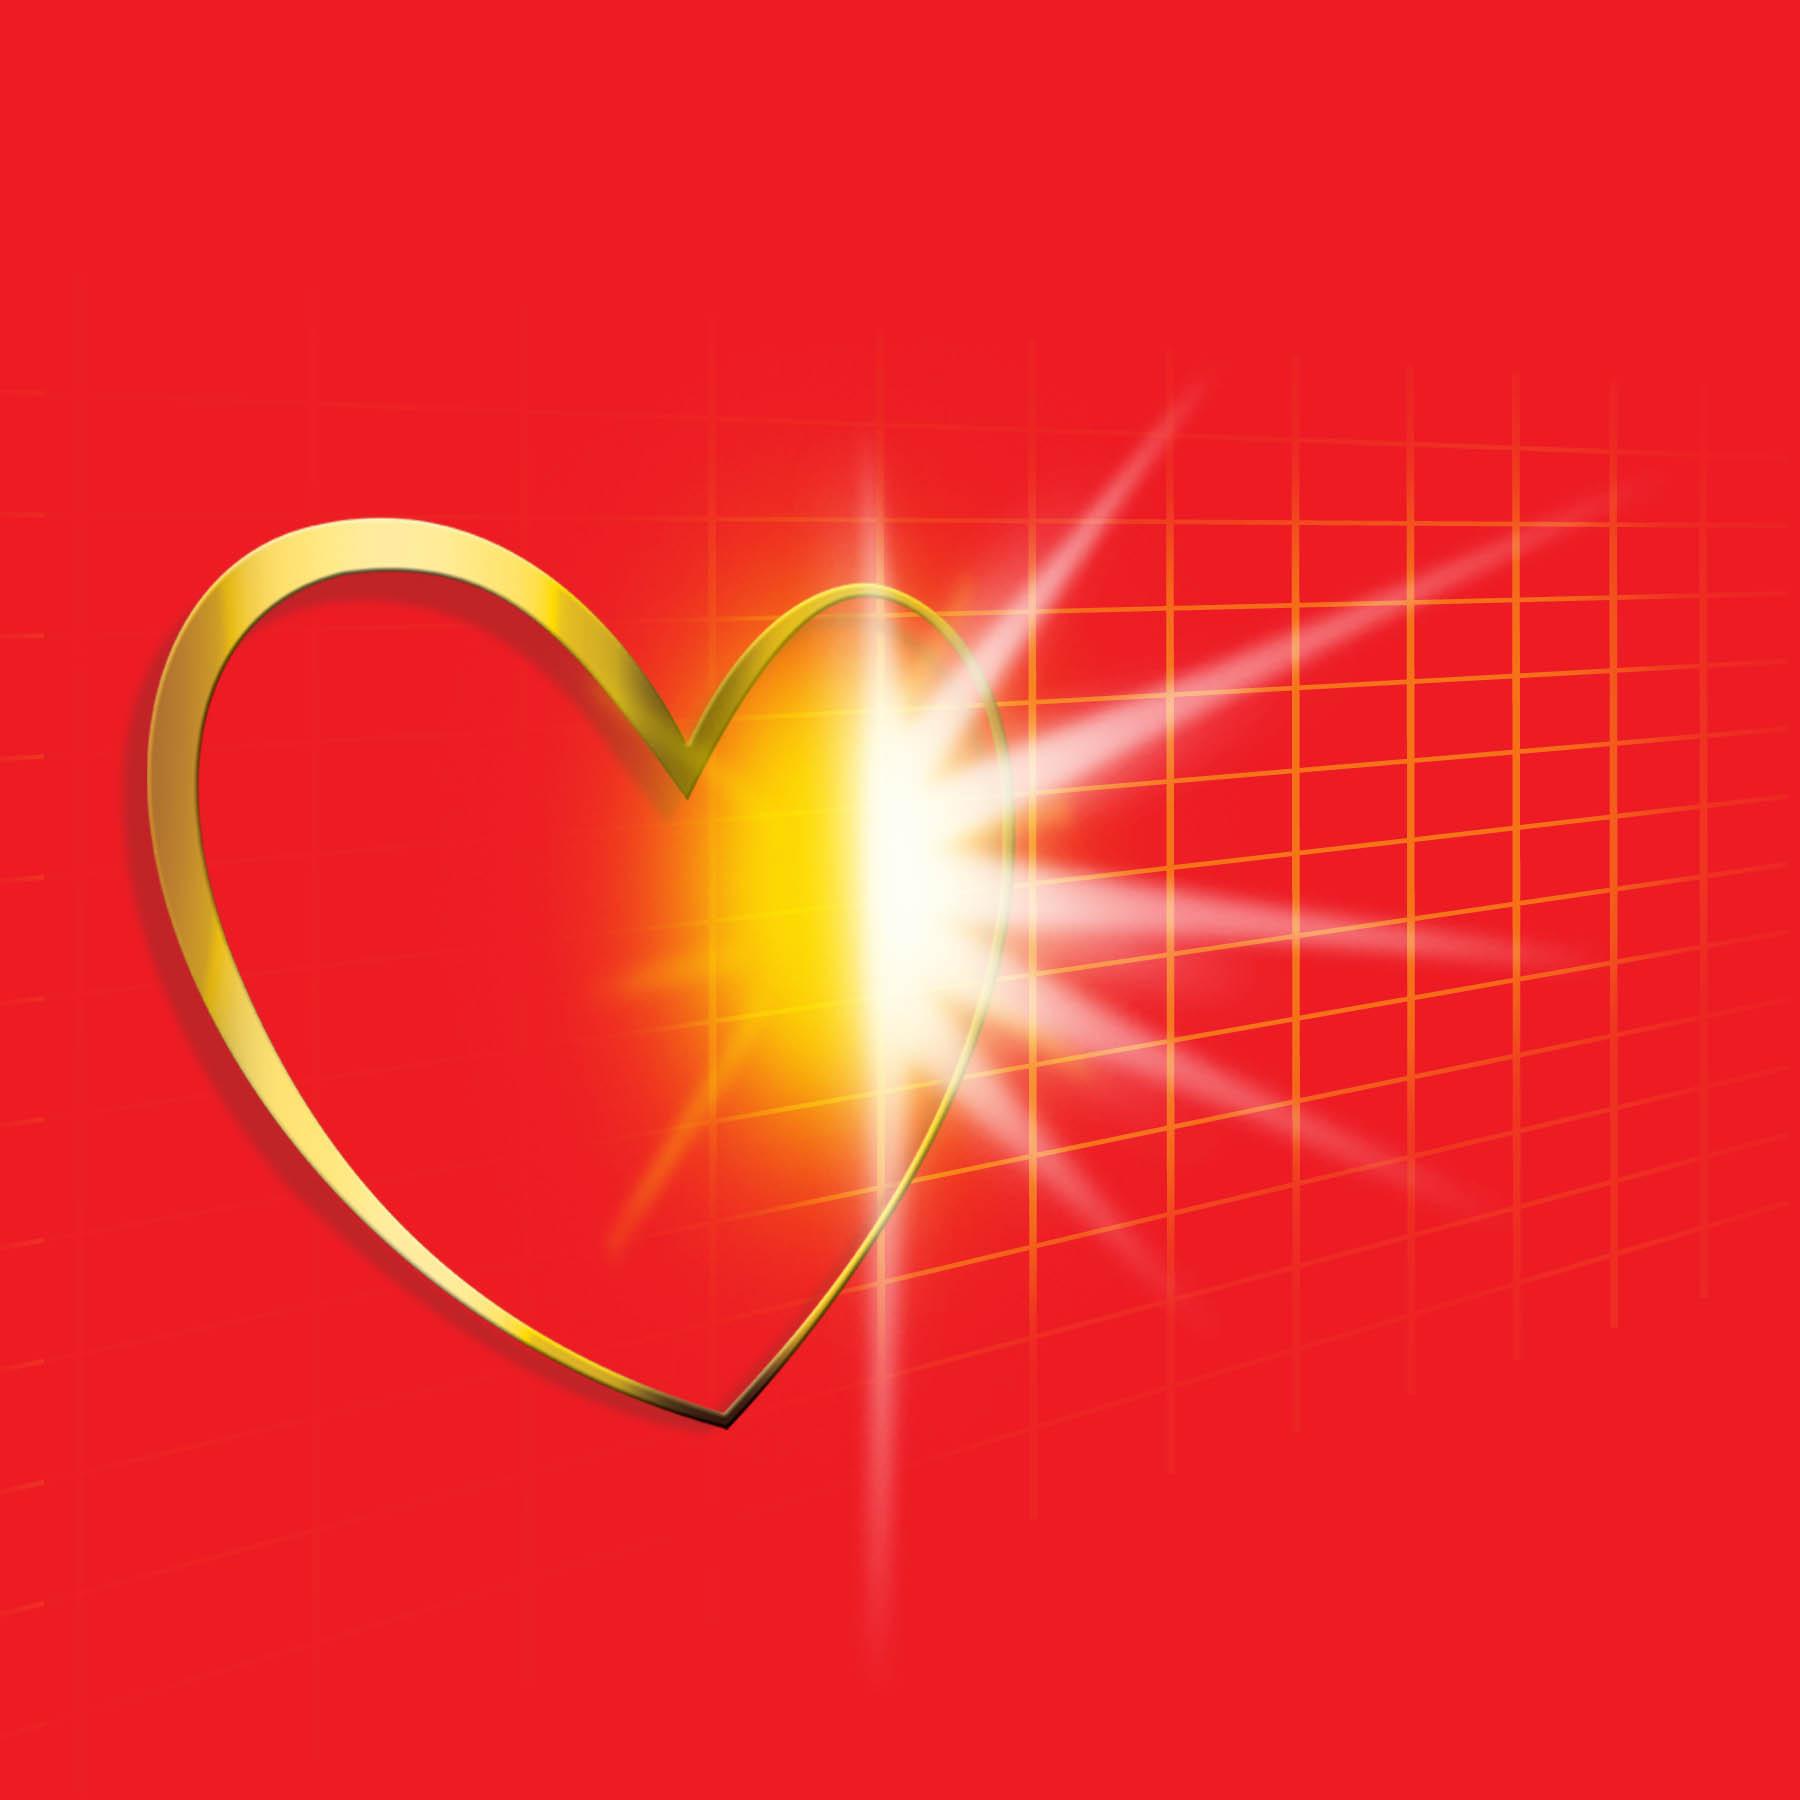 Bayer EKG Heart Graphic